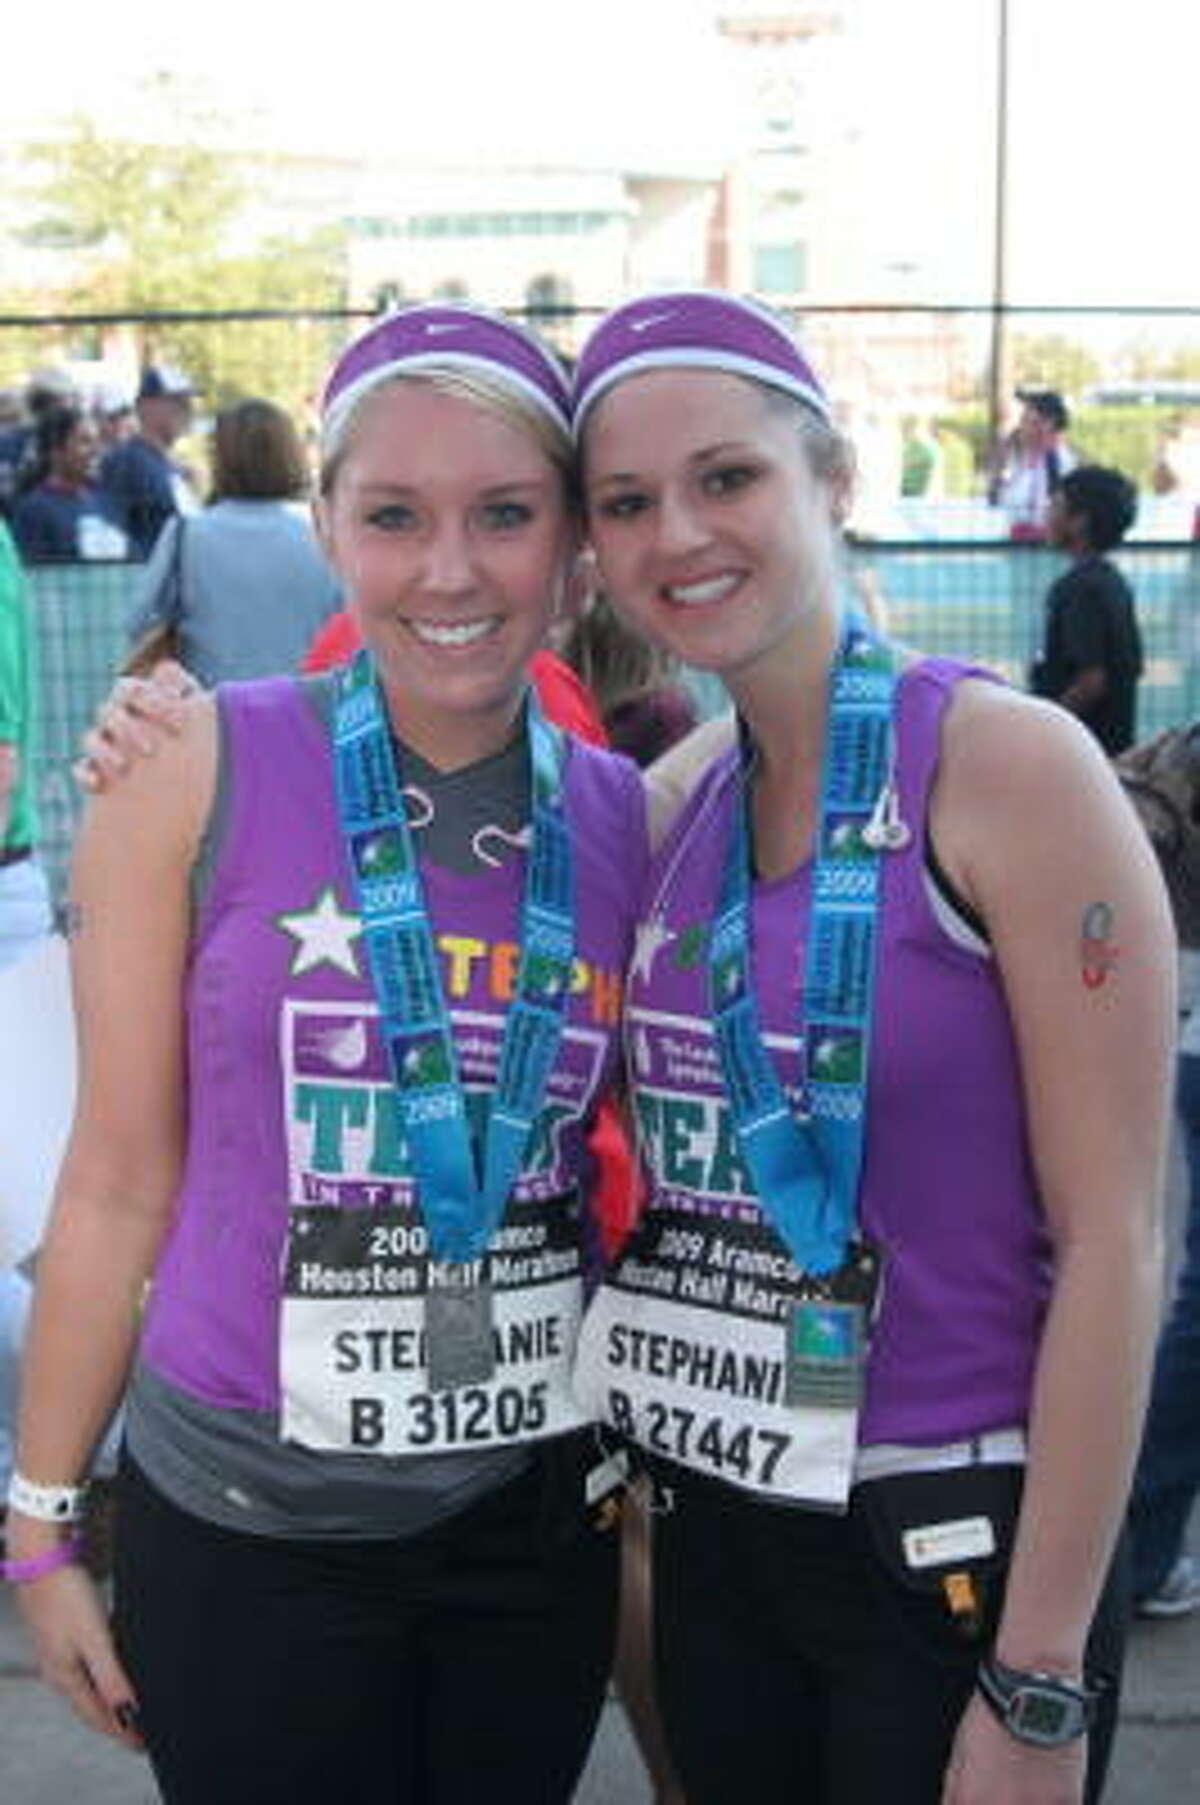 Stephanie Lubojacky, left, and Stephanie Smith